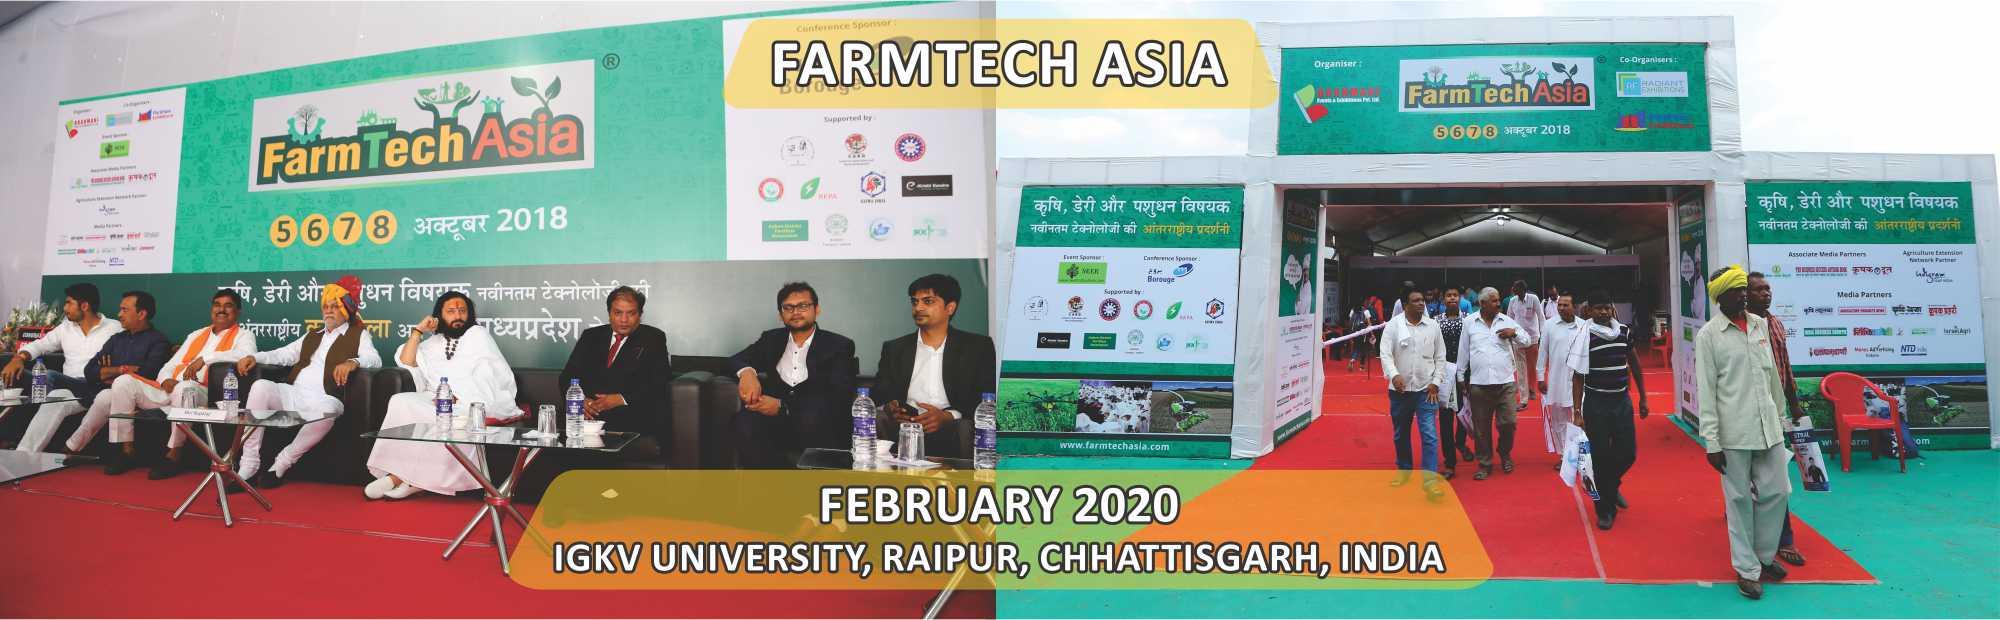 FARMTECH ASIA 2020